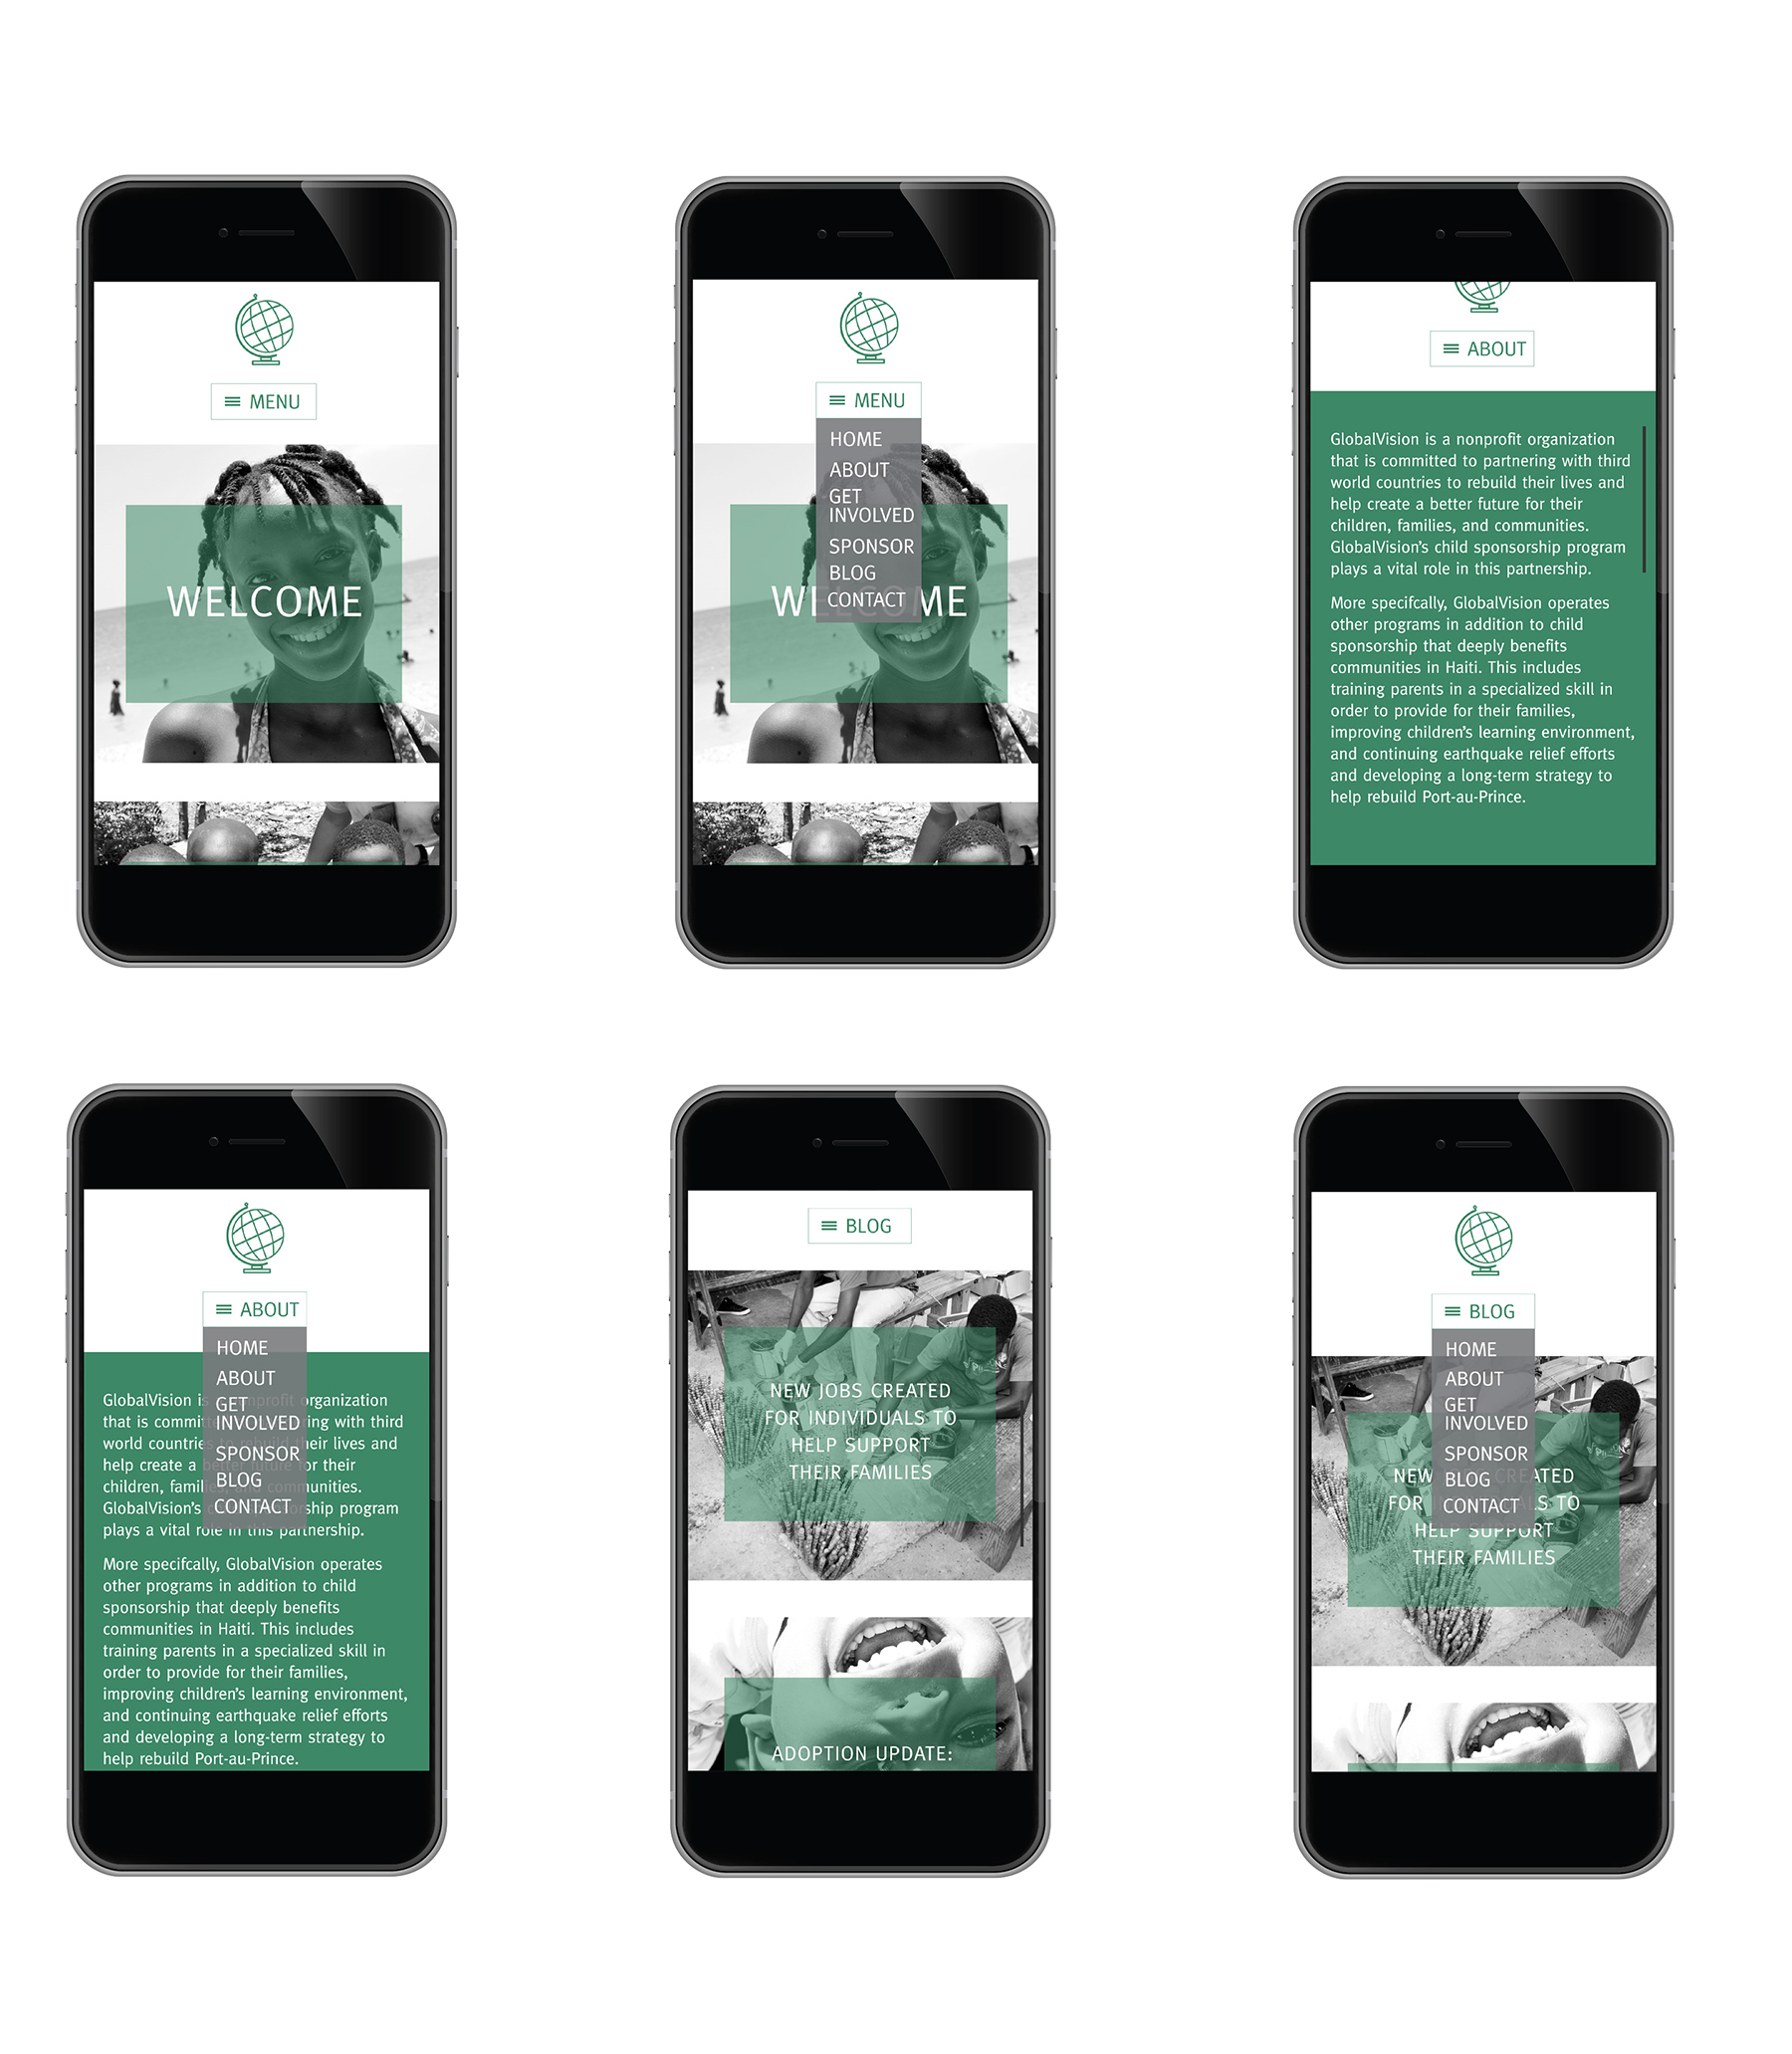 C. Budd / / Mobile device design